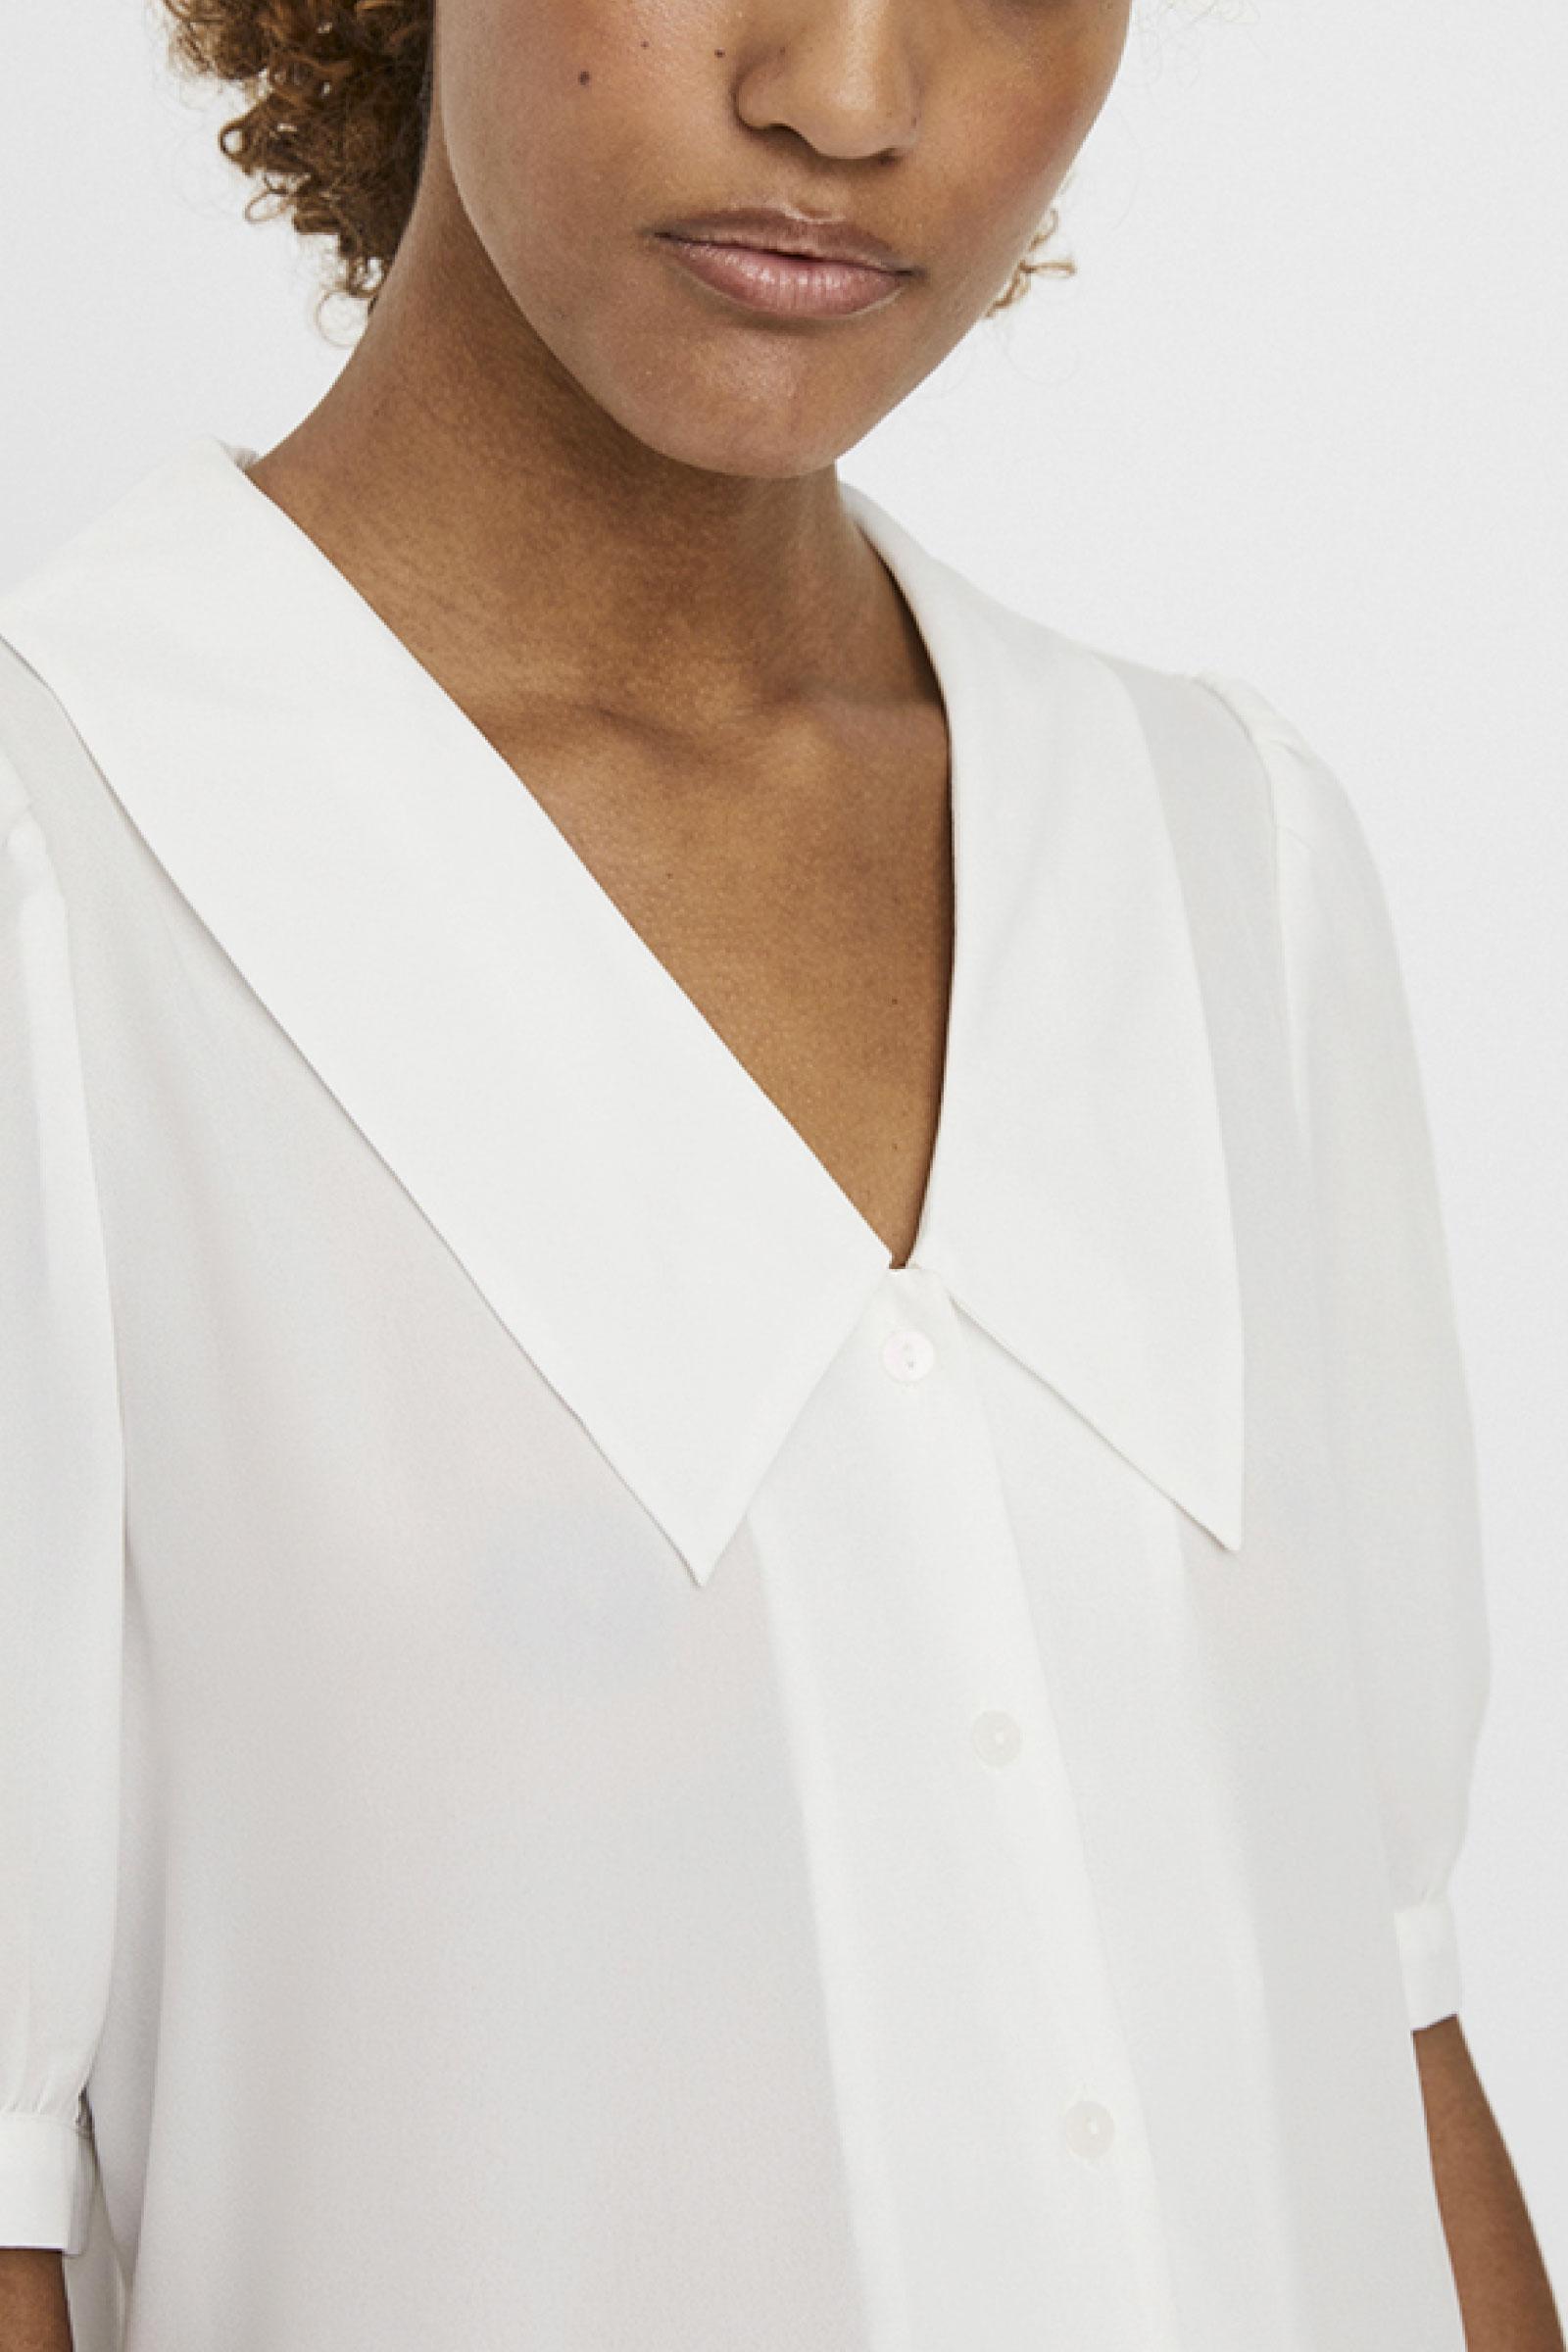 VERO MODA | Shirt | 10247261Snow White